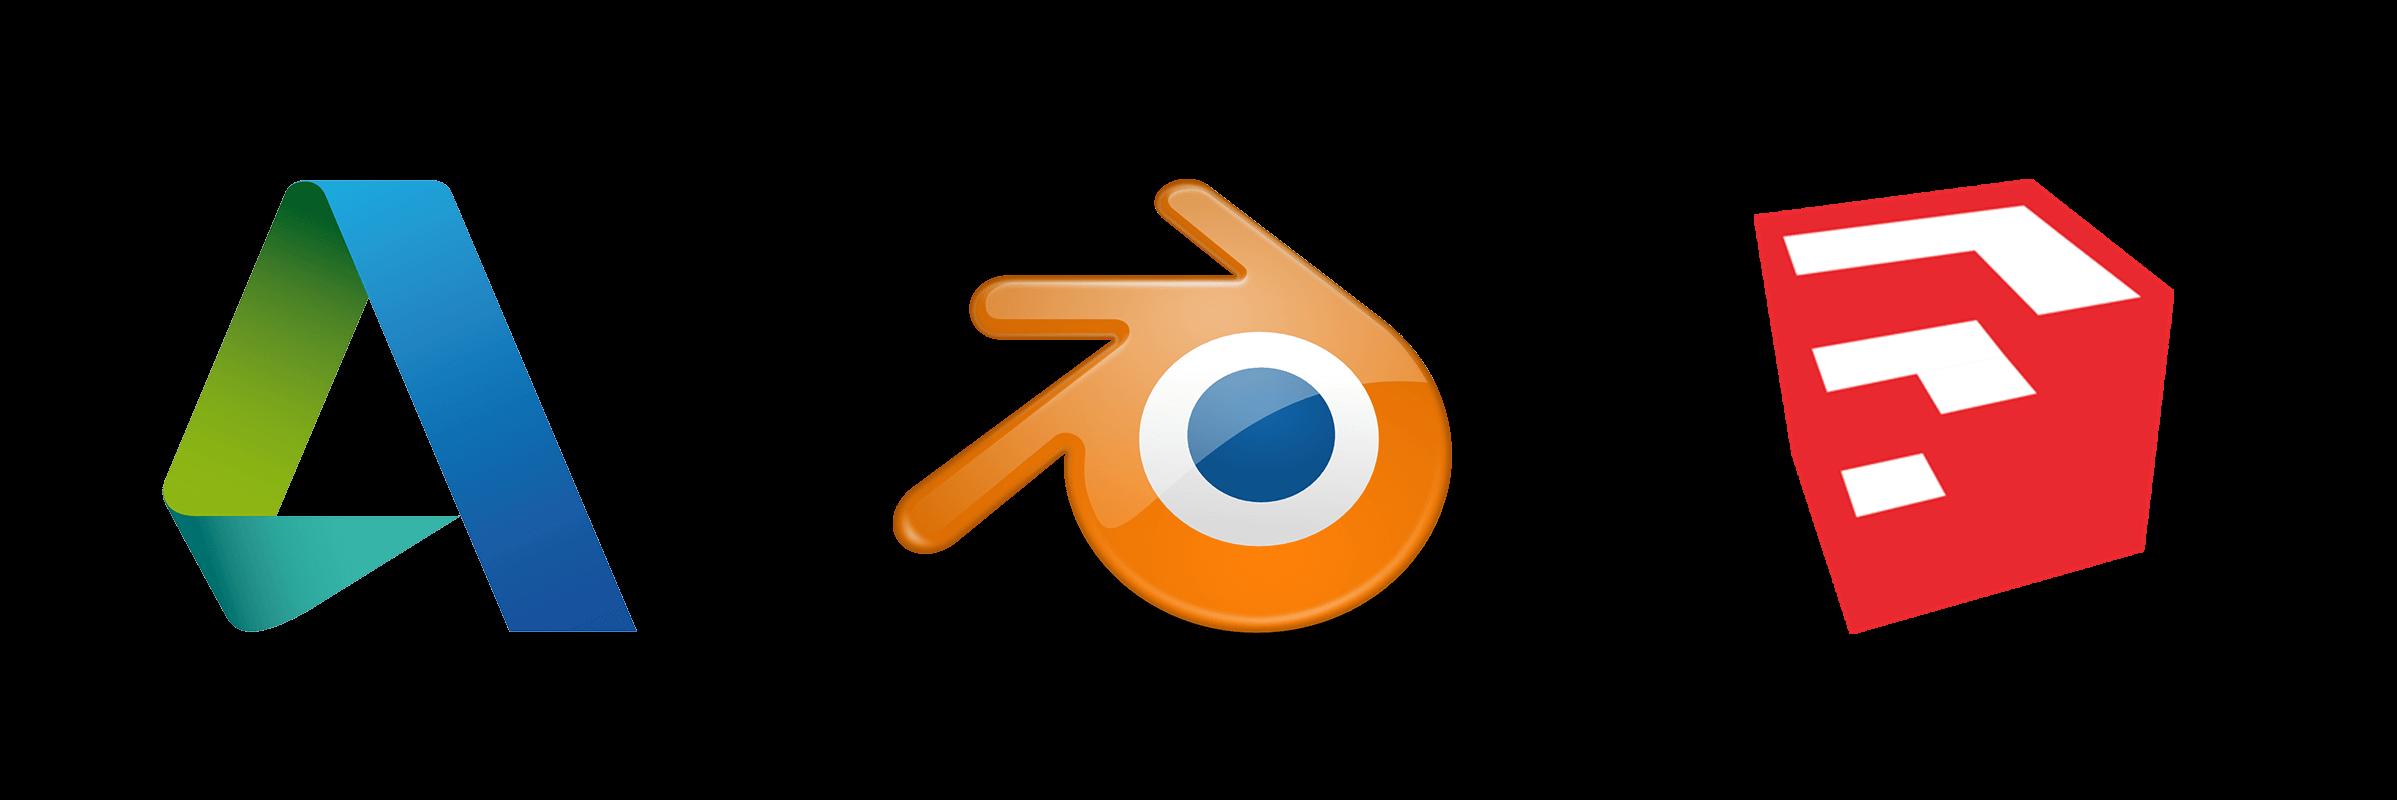 Logos 3D-Modelling-Programme